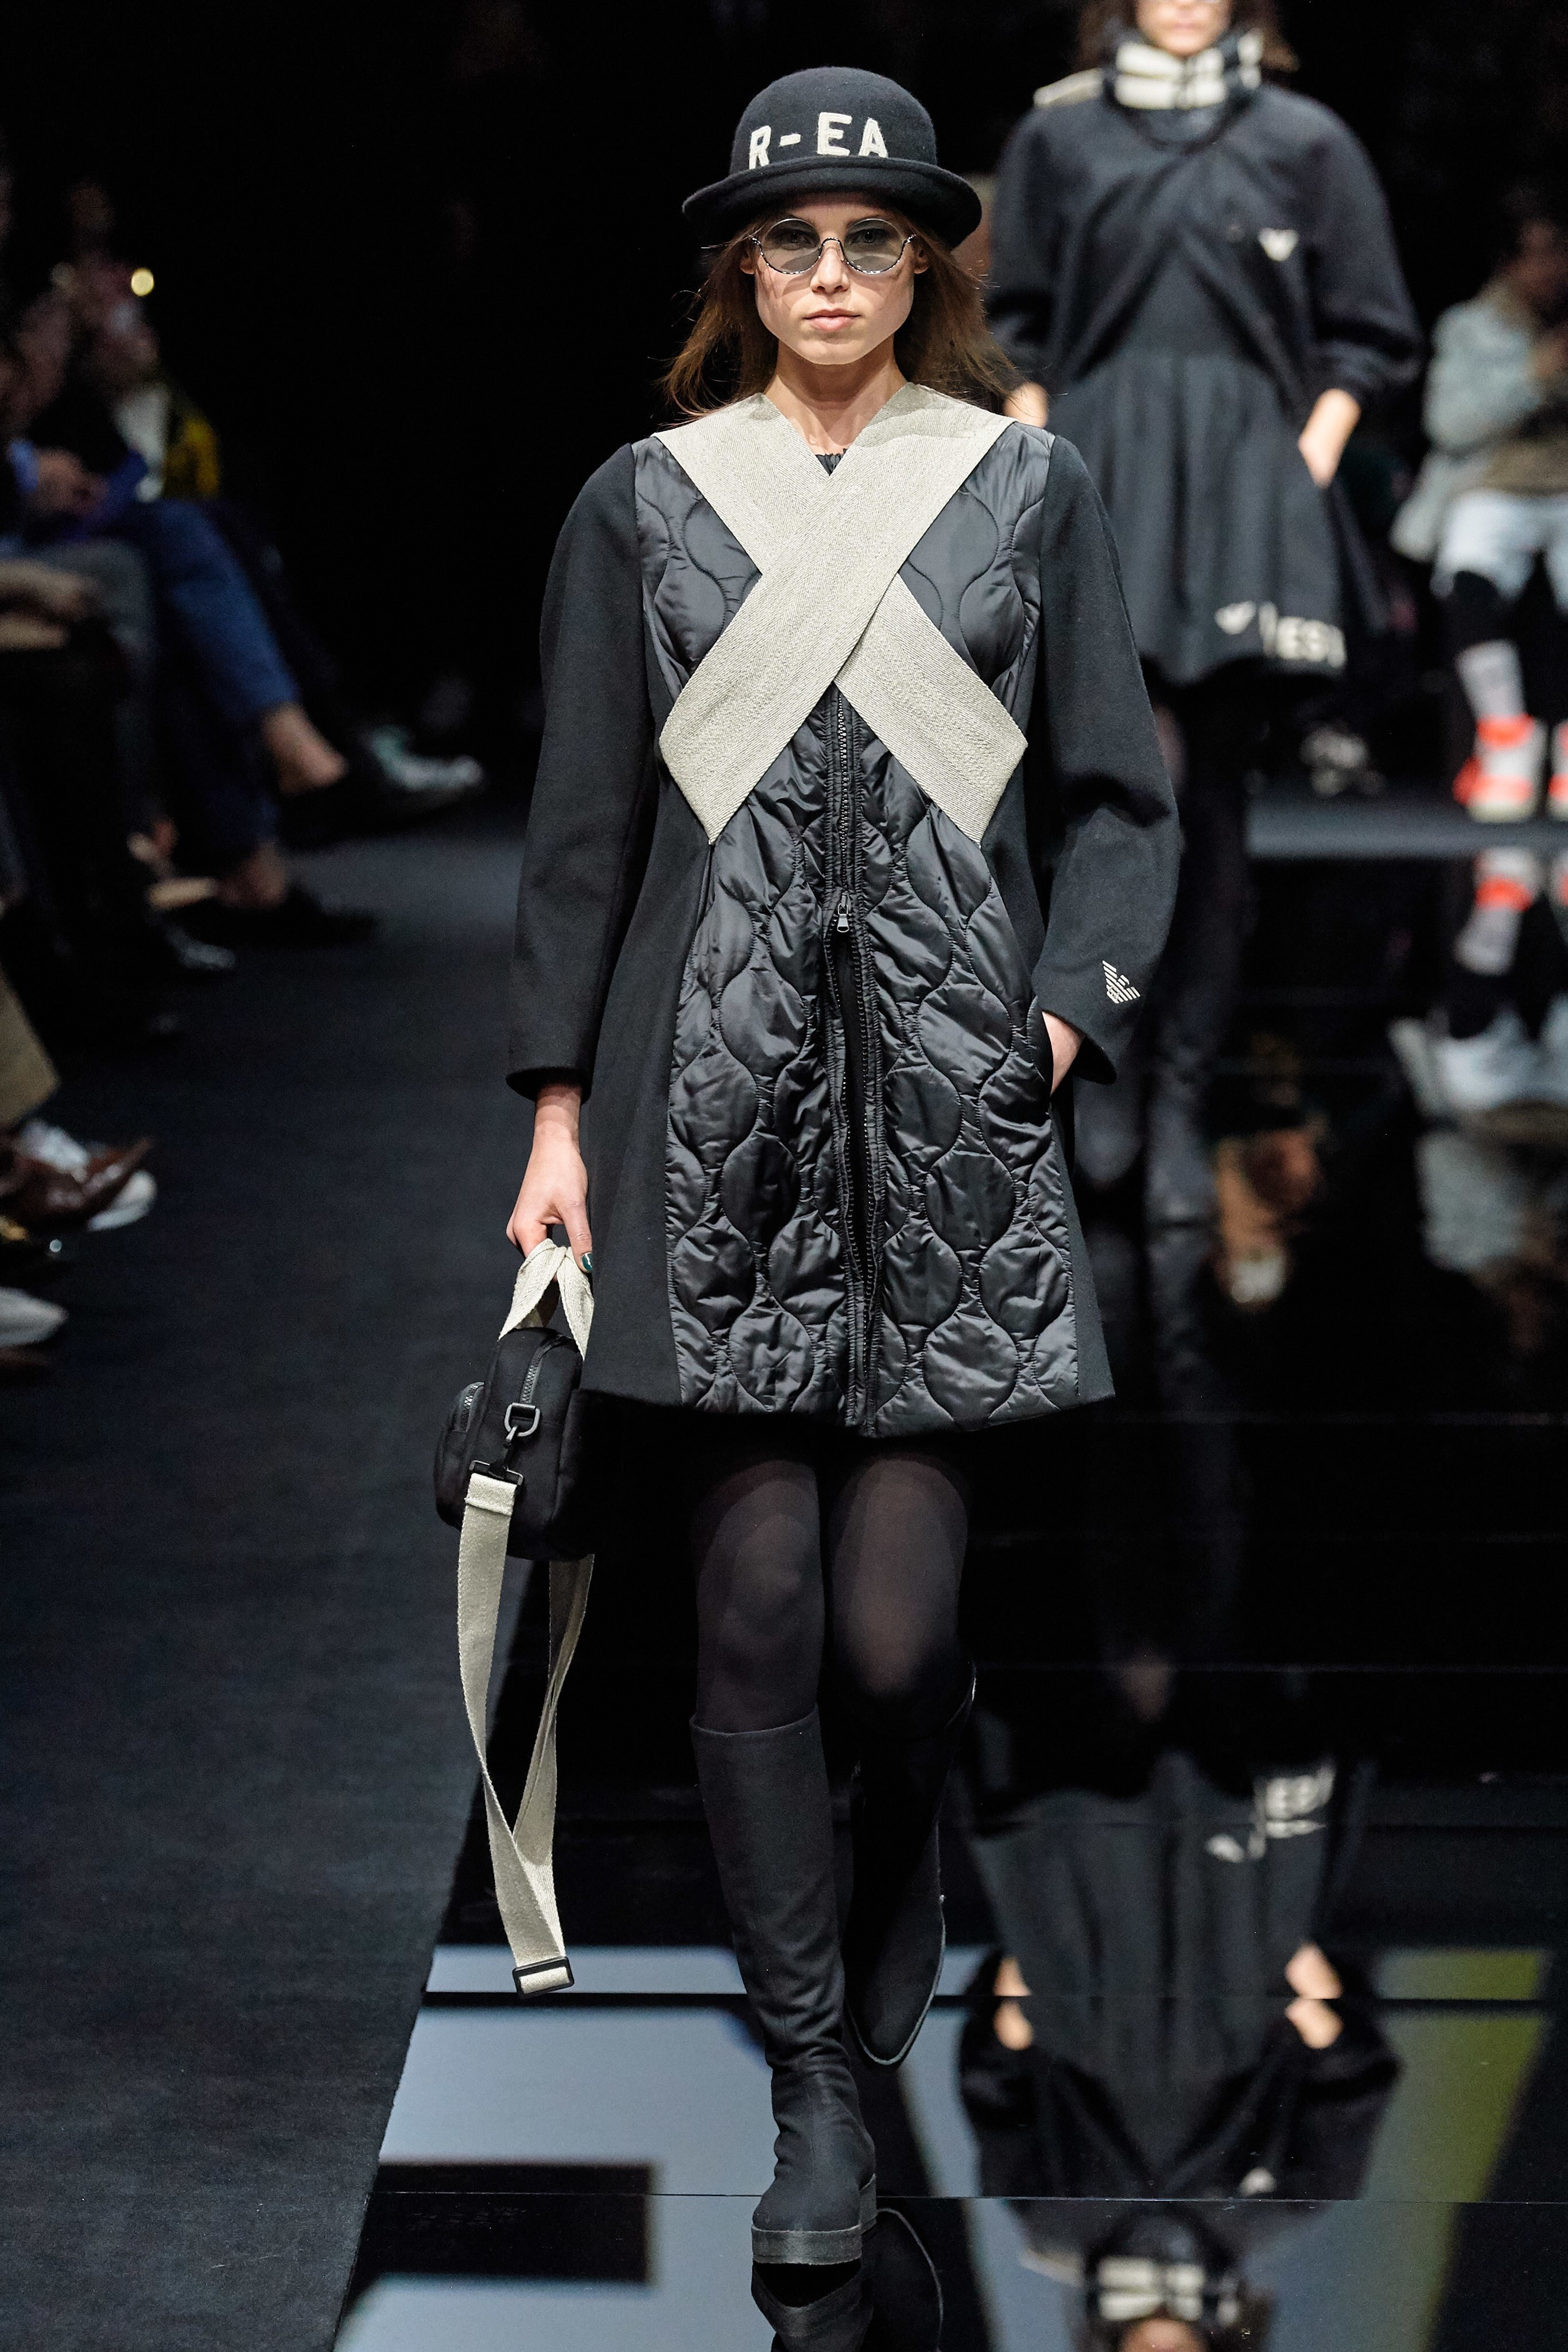 Emma Macgowan walks for Emporio Armani F/W 2020 | Pride Models news